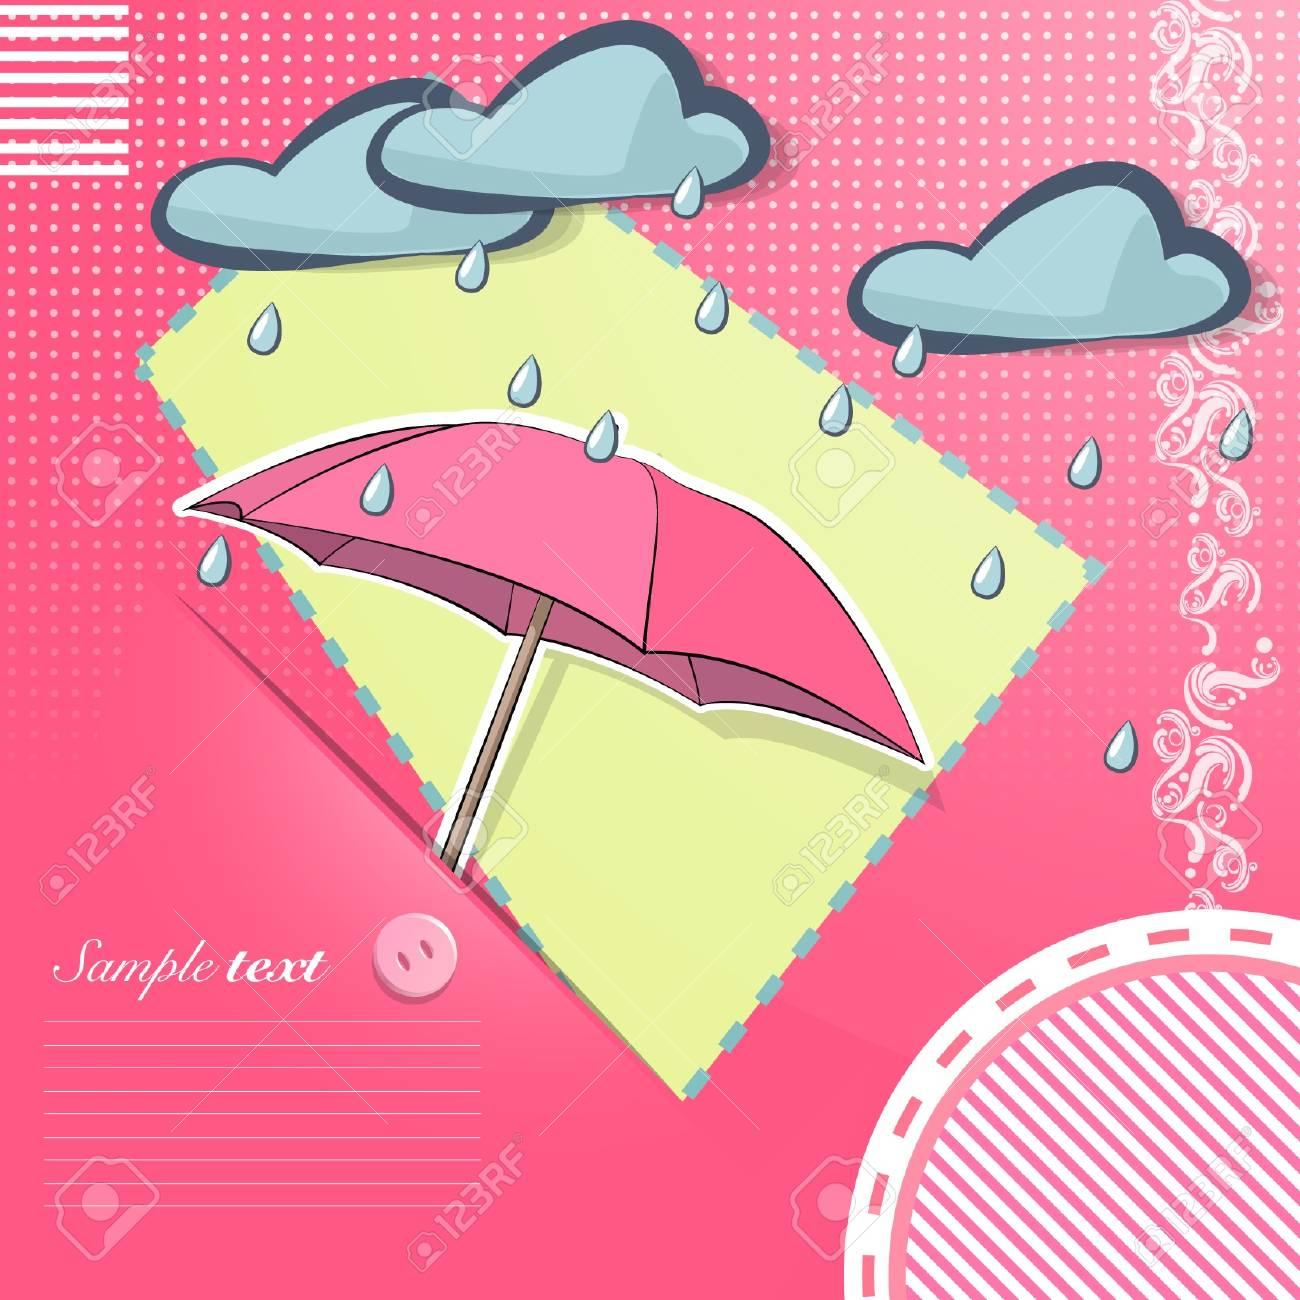 Umbrella on pink fabric illustration Stock Vector - 17407104